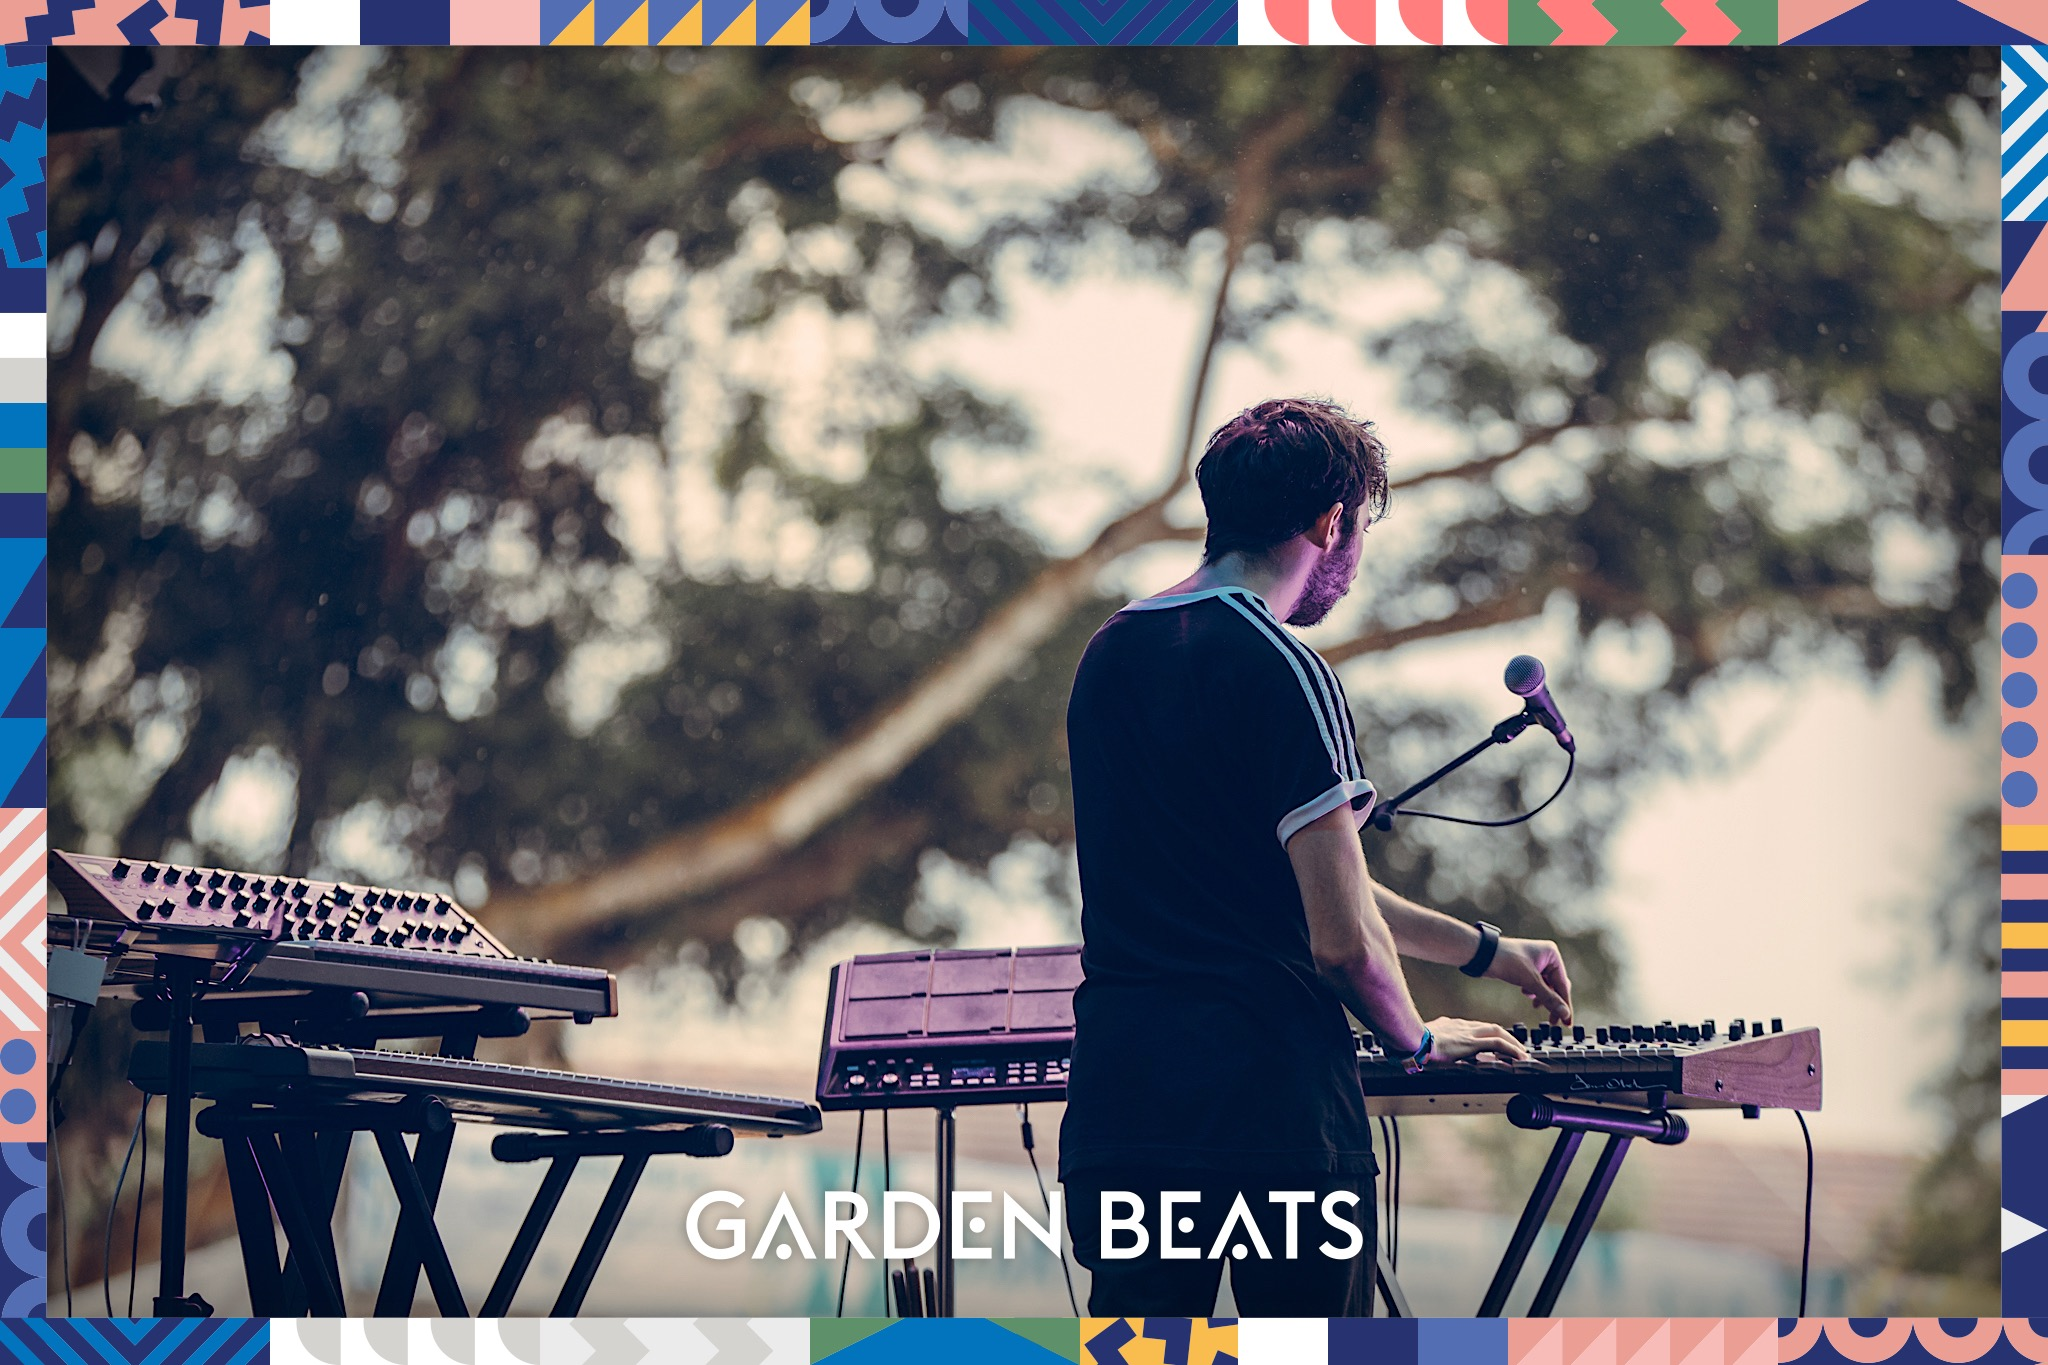 03032018_GardenBeats_Colossal531_Watermarked.jpg